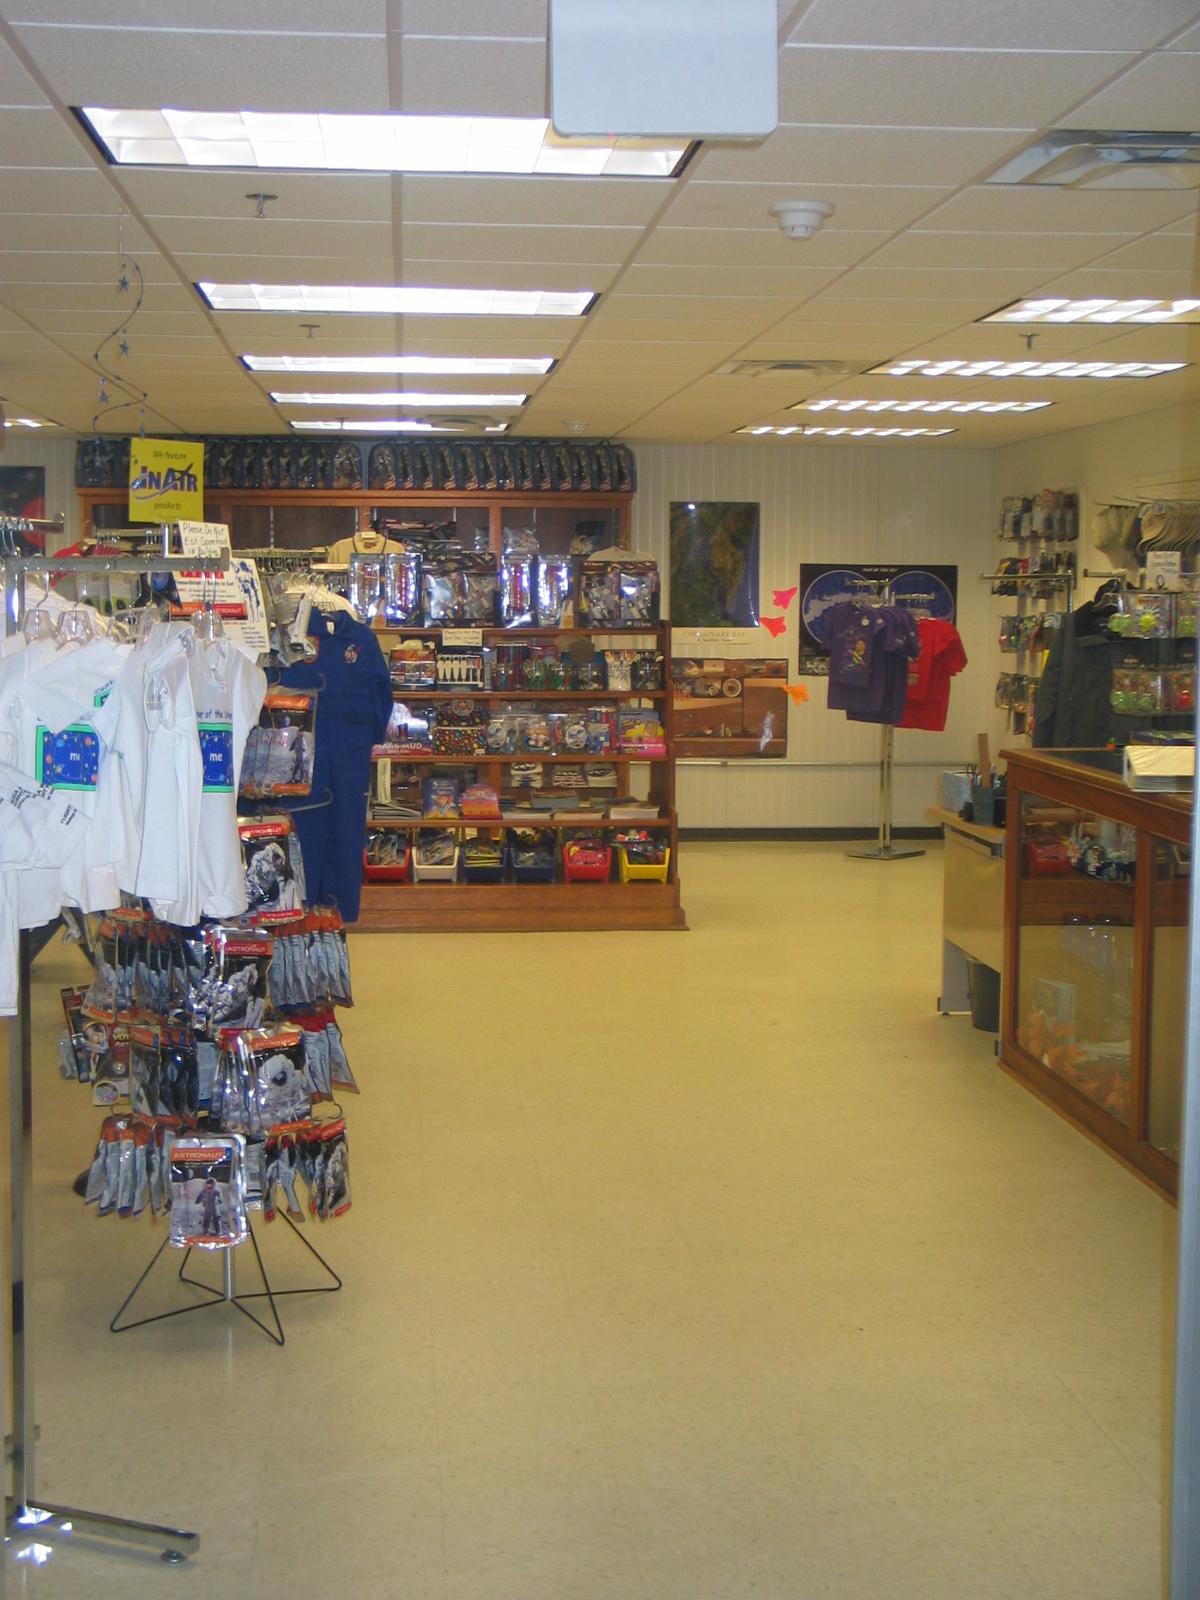 nasa wallops visitor center - photo #8